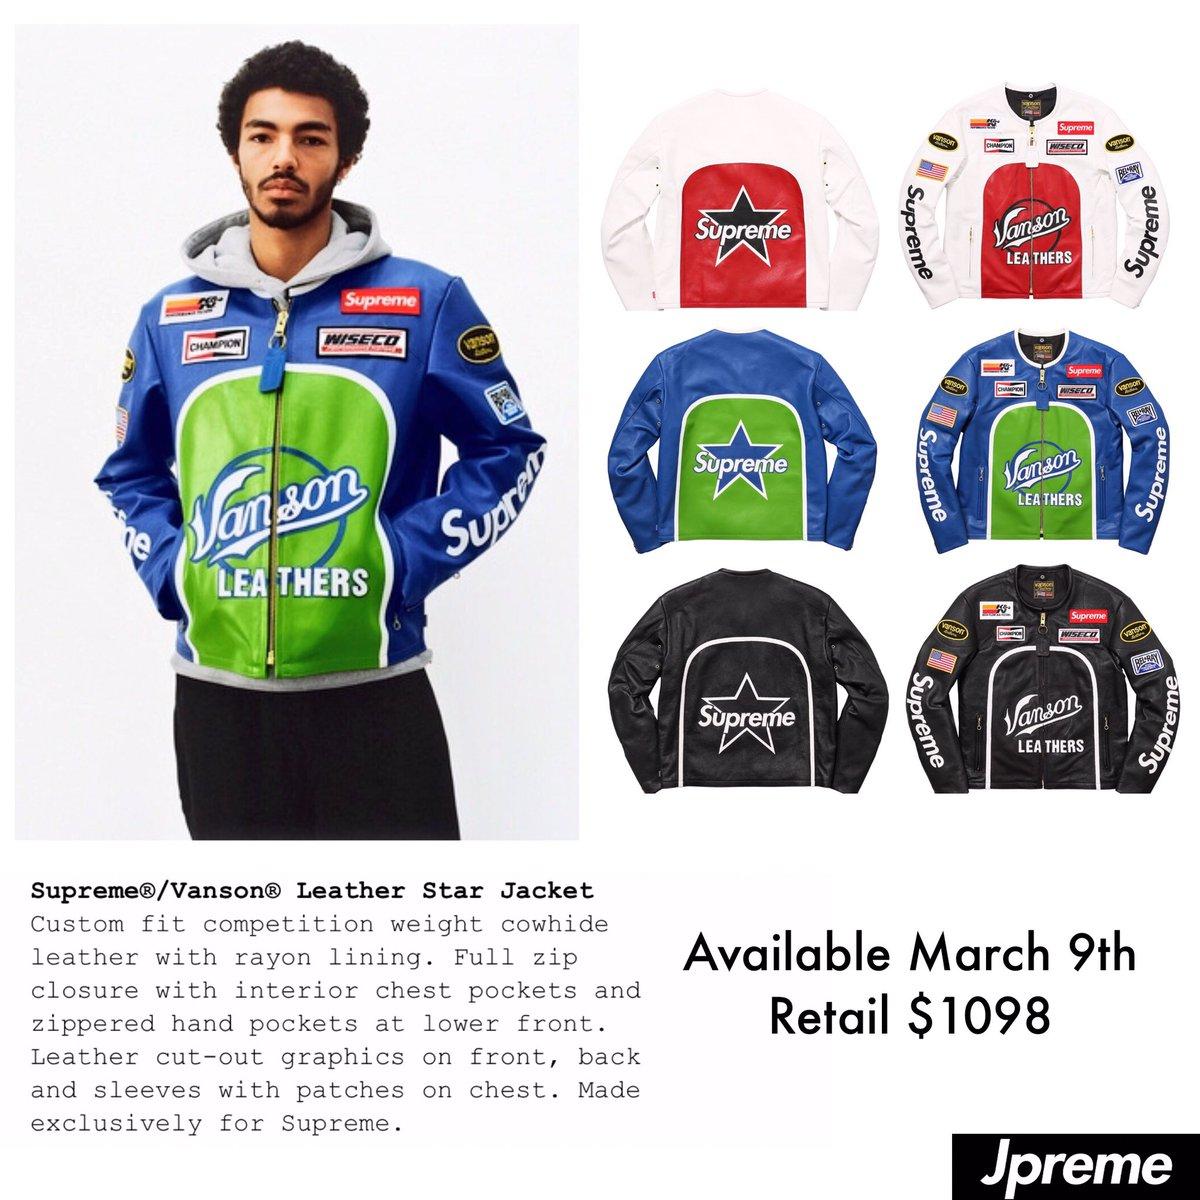 Supreme Vanson Leather Jacket Retail